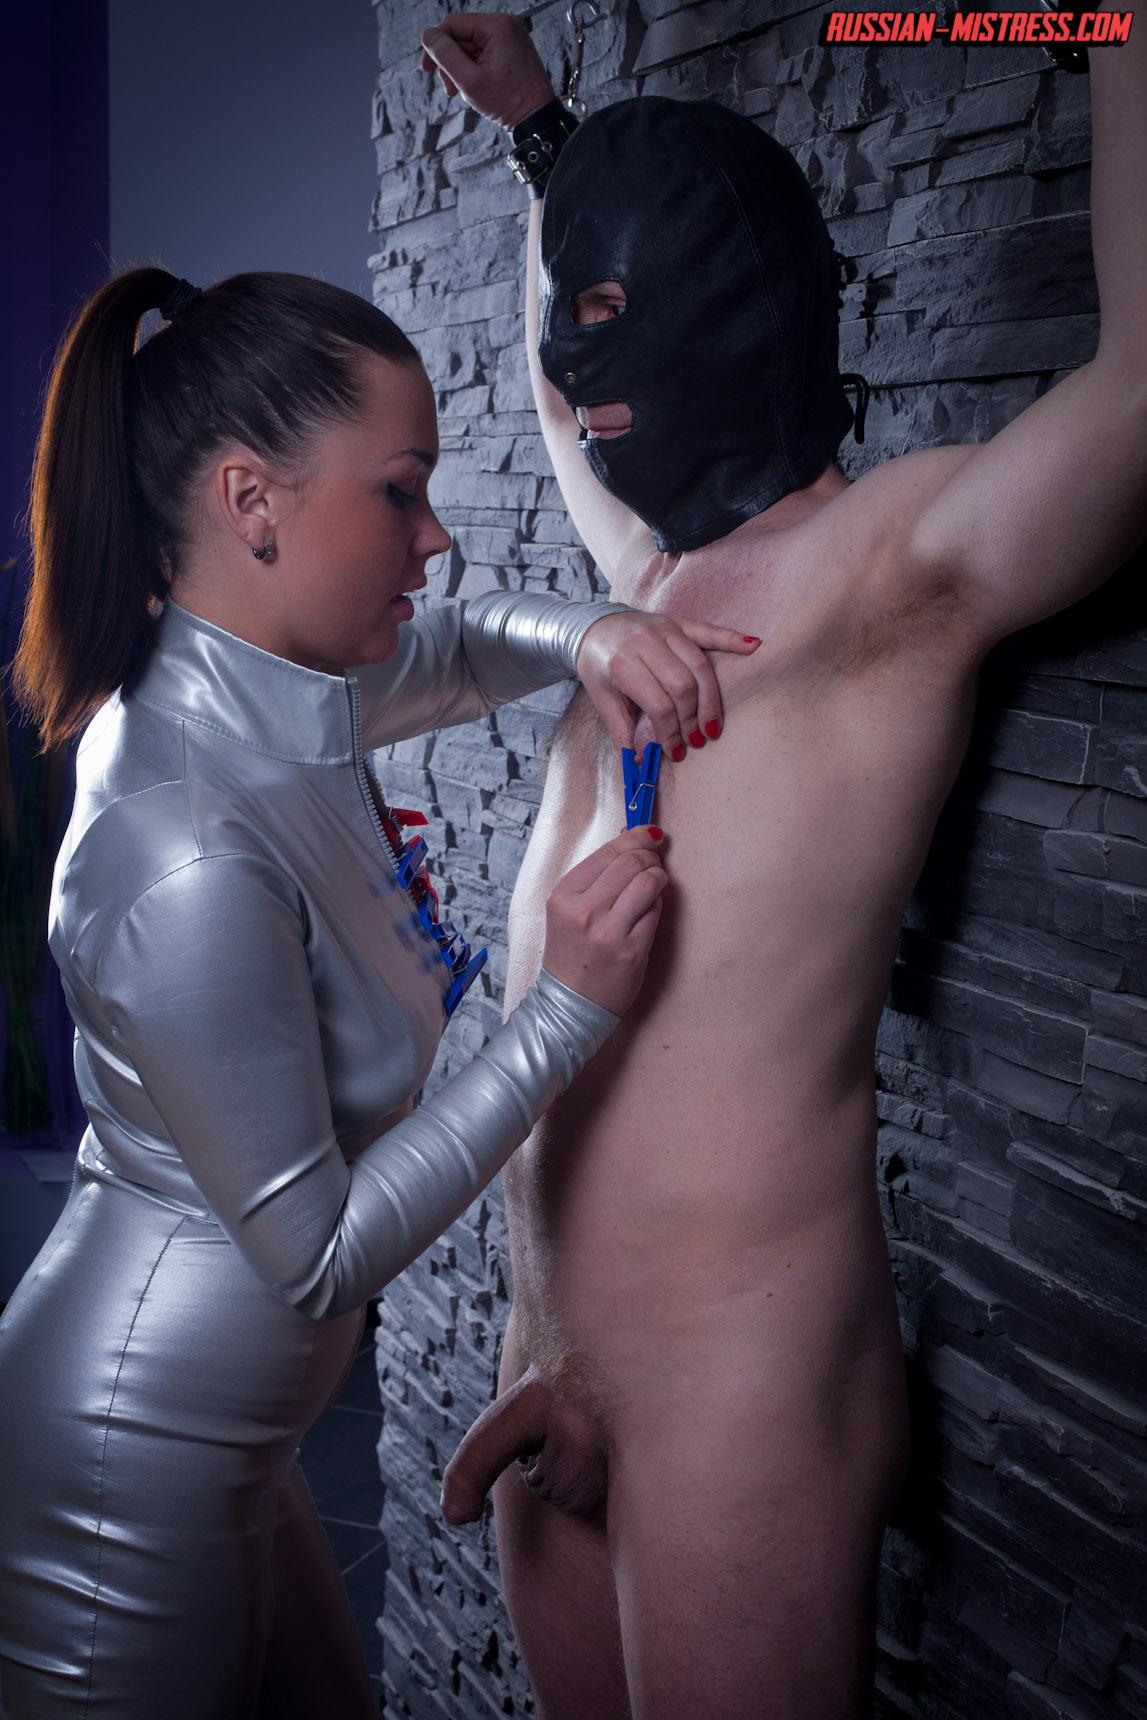 http://russianmistress.femdomworld.com/218/01/pics/img08.jpg